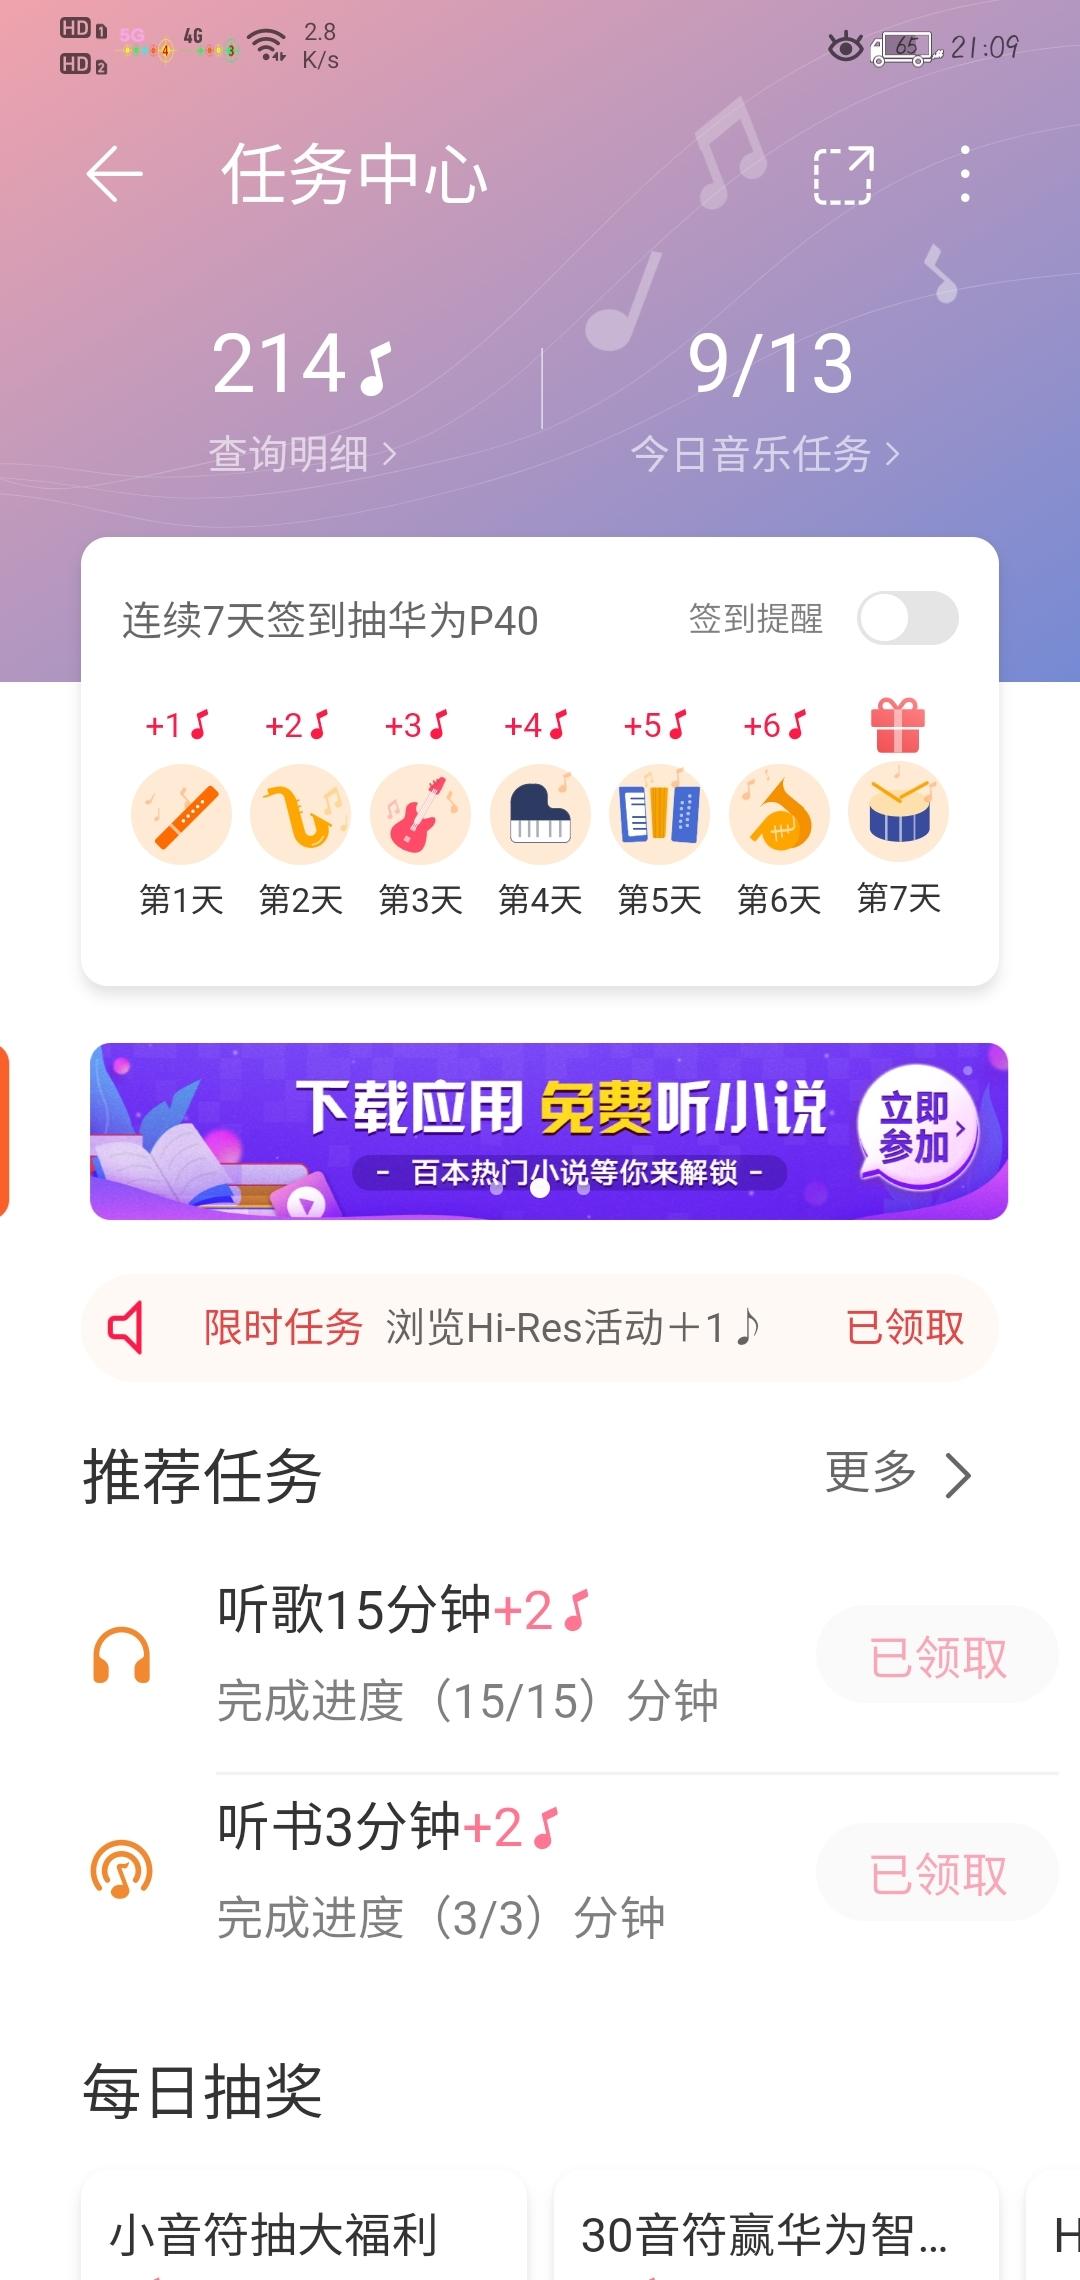 Screenshot_20200707_210905_com.android.mediacenter.jpg